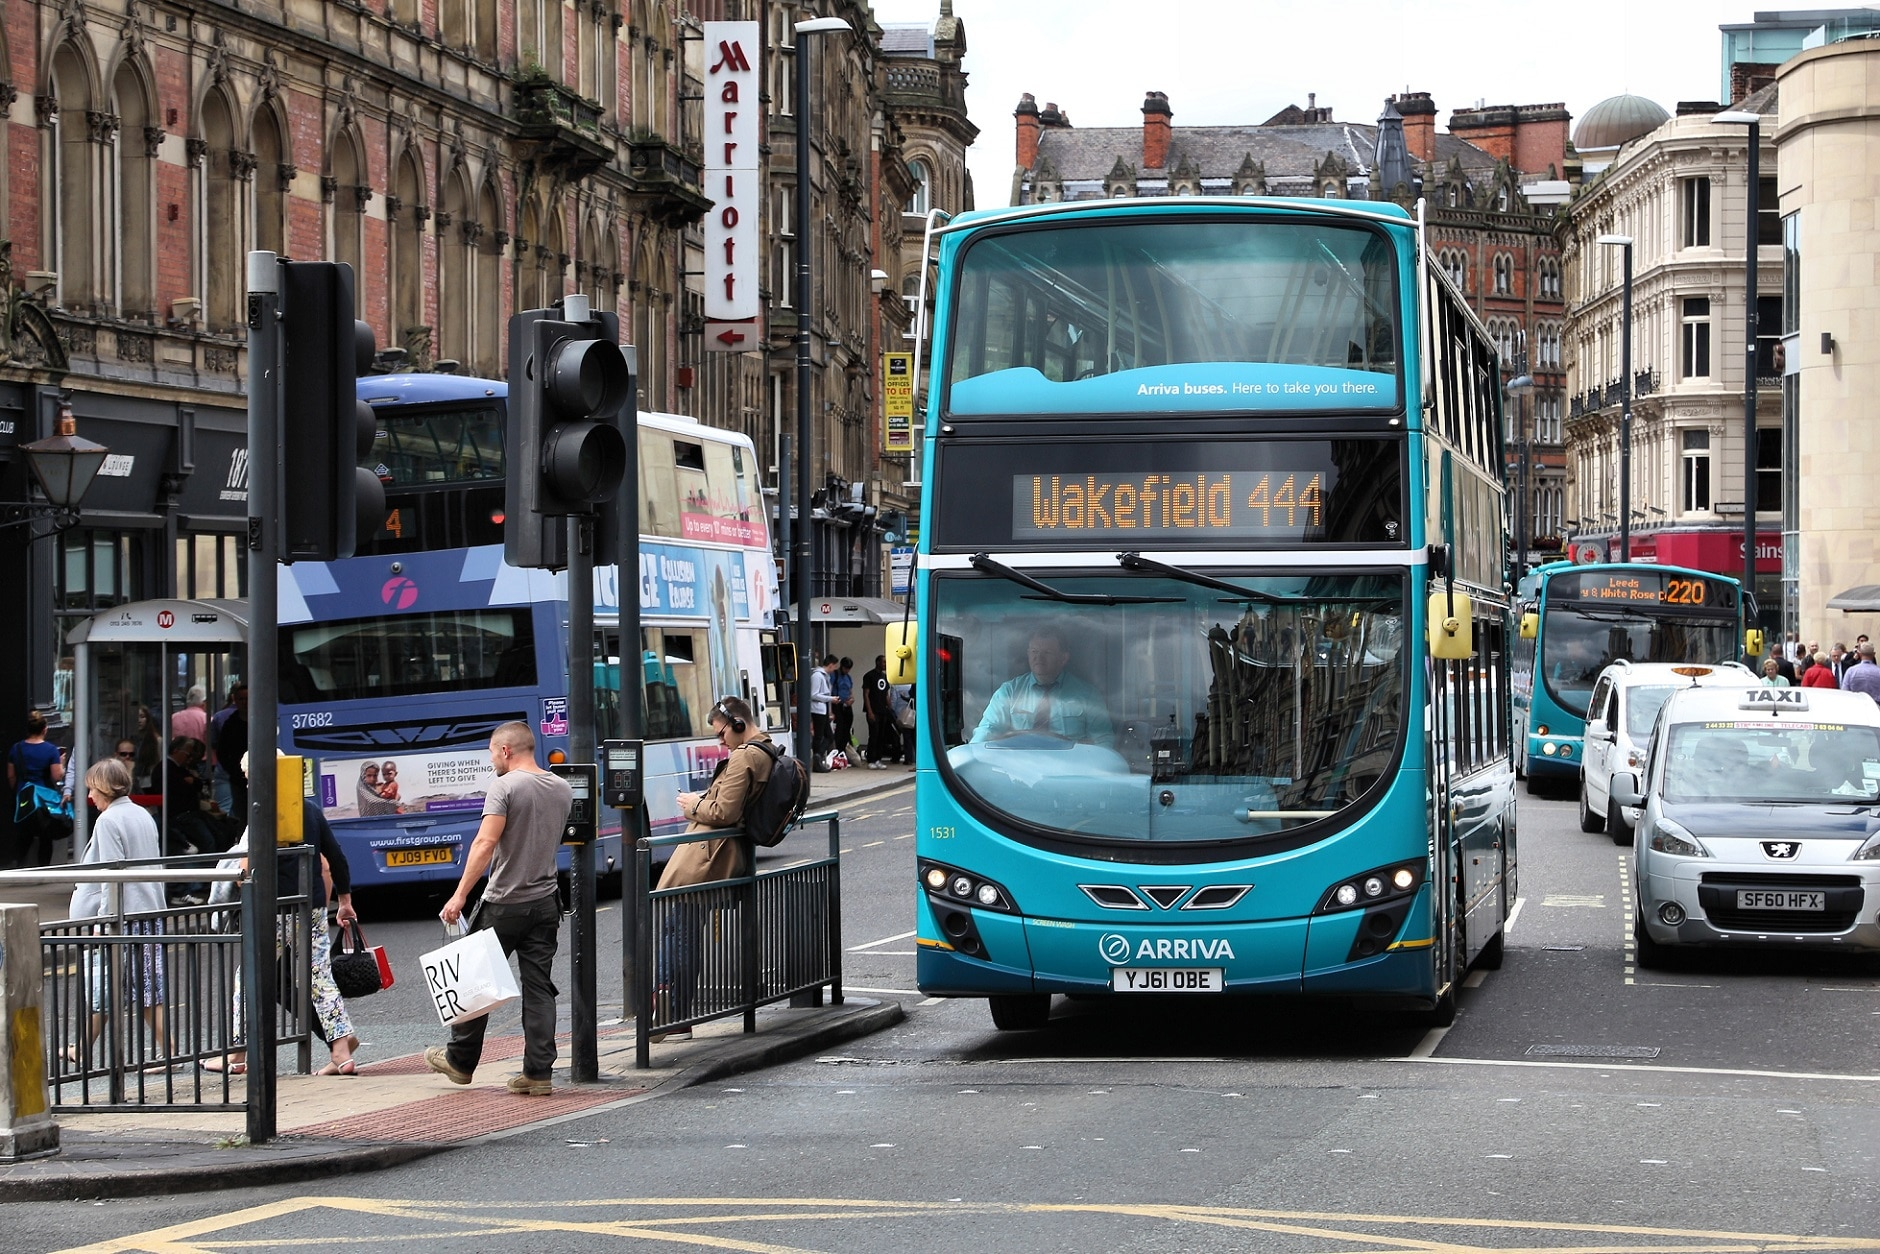 West Yorkshire bus franchising plans